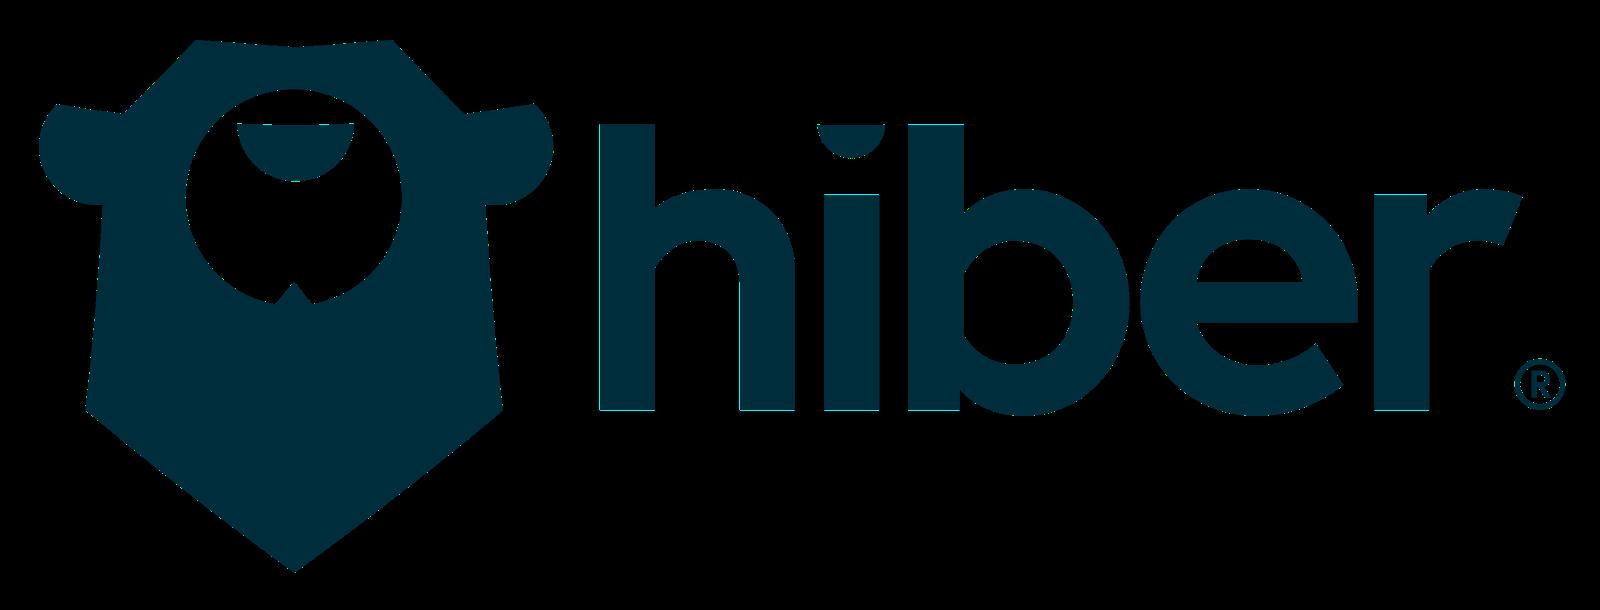 Hiber Amsterdam